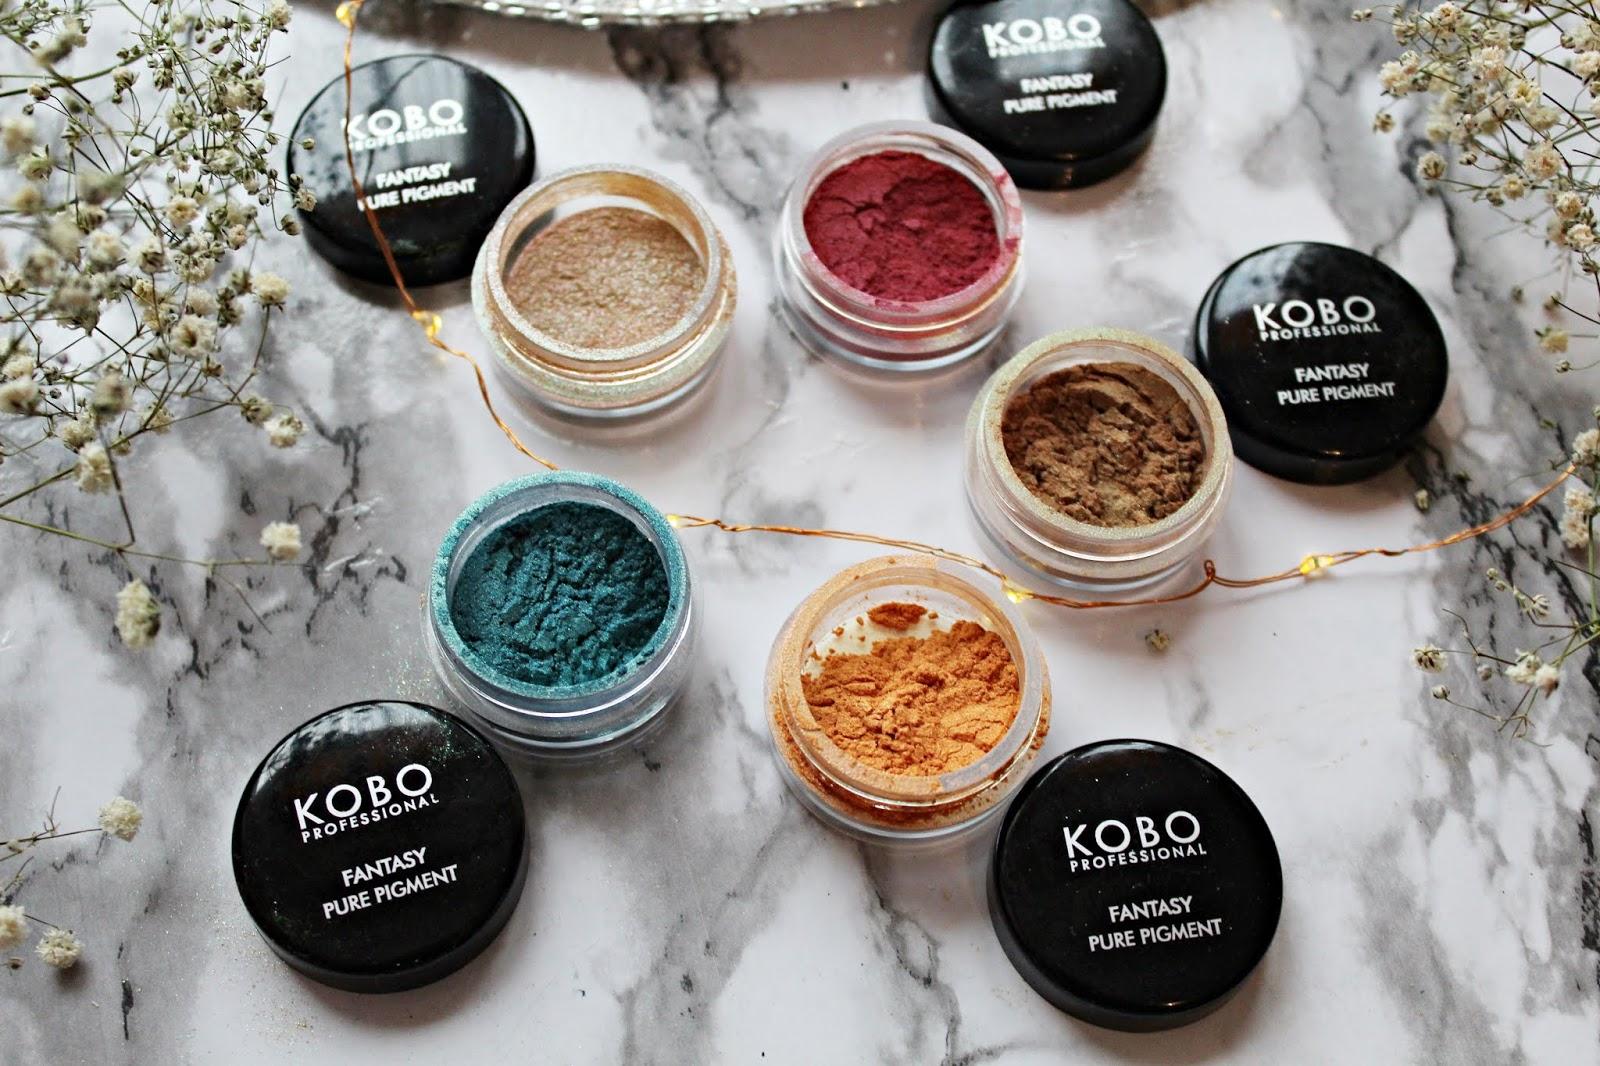 Kobo Professional Fantasy Pure Pigment